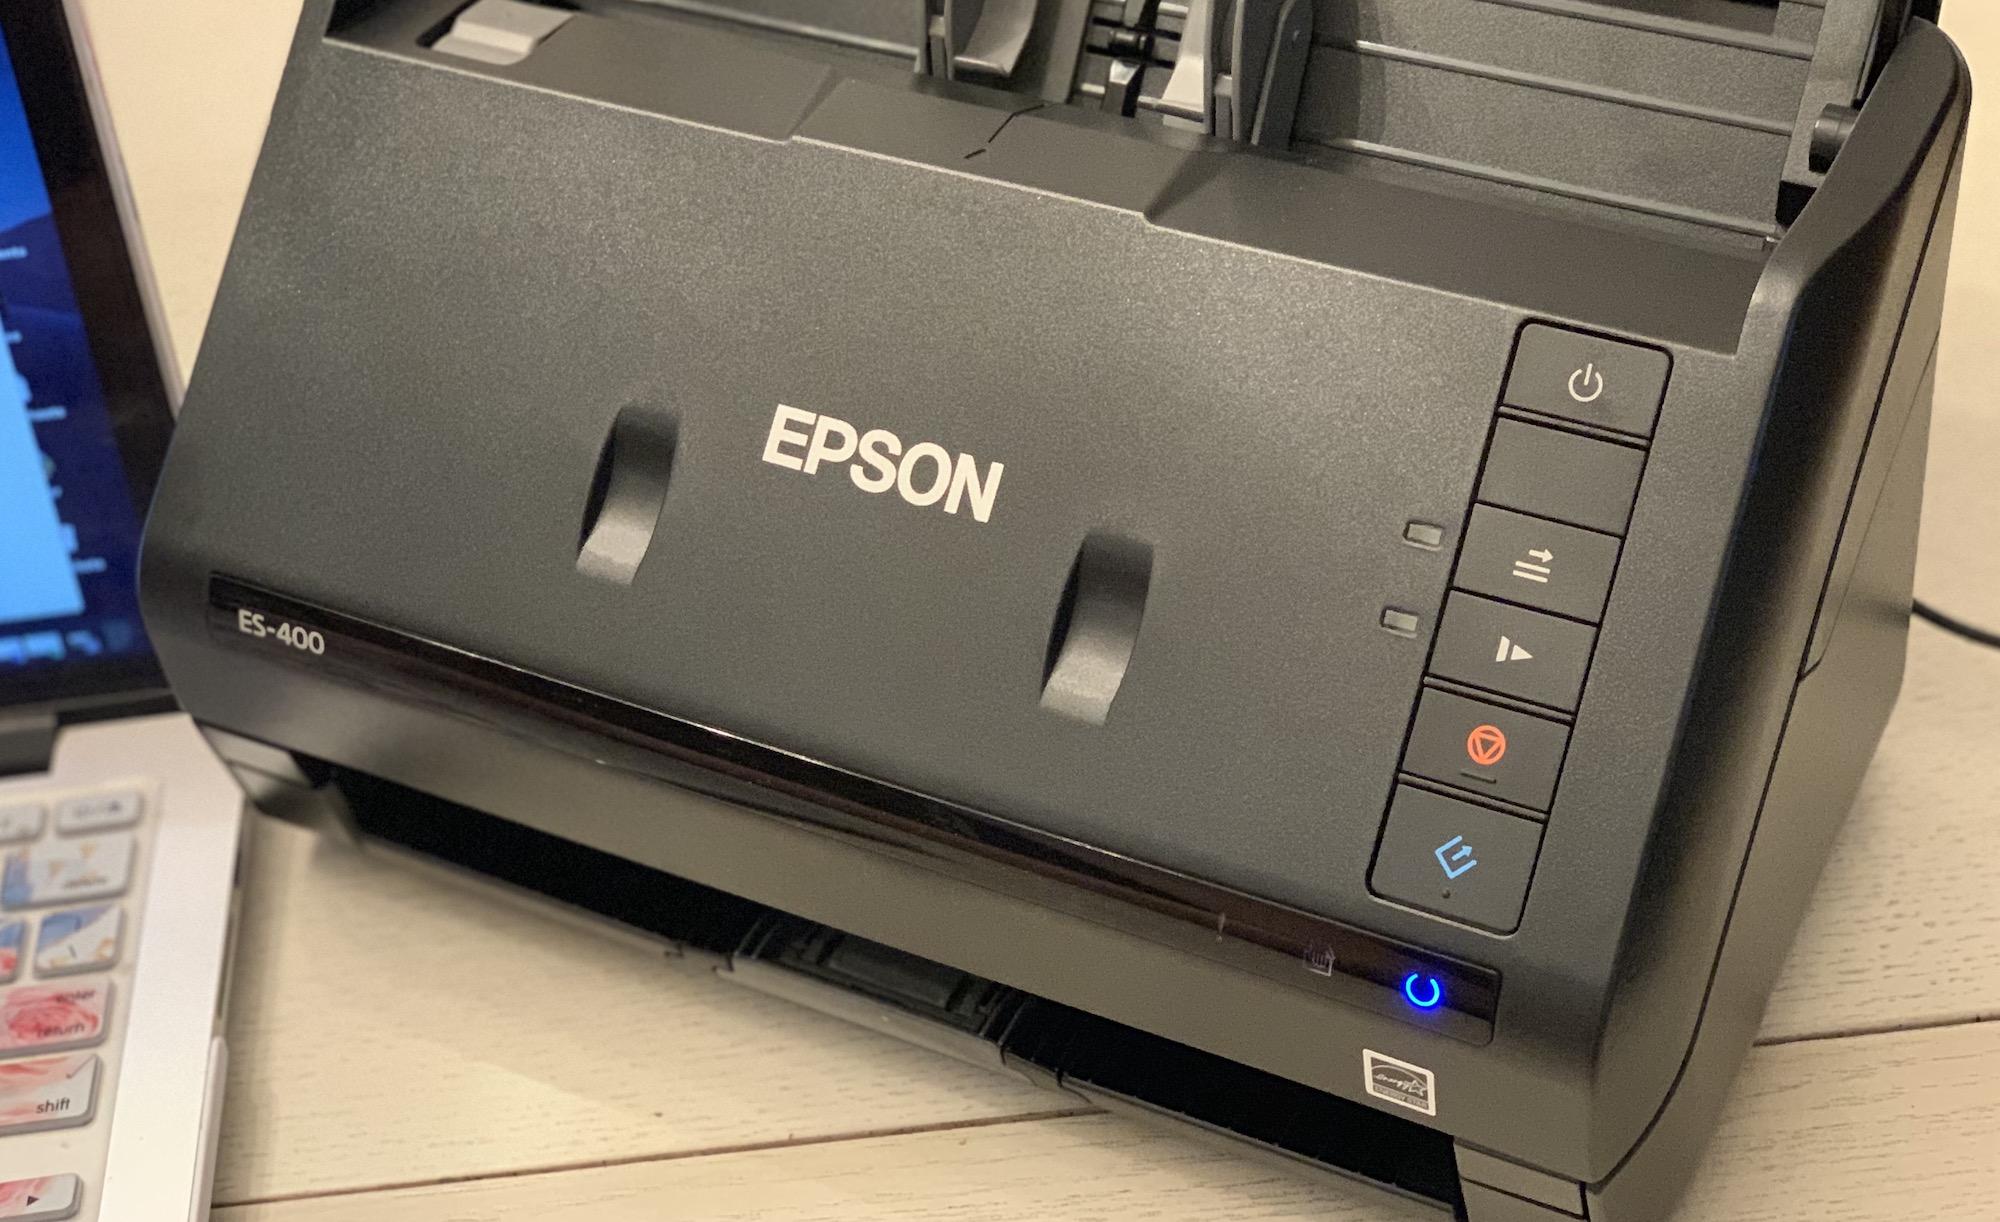 Epson ES-400 options